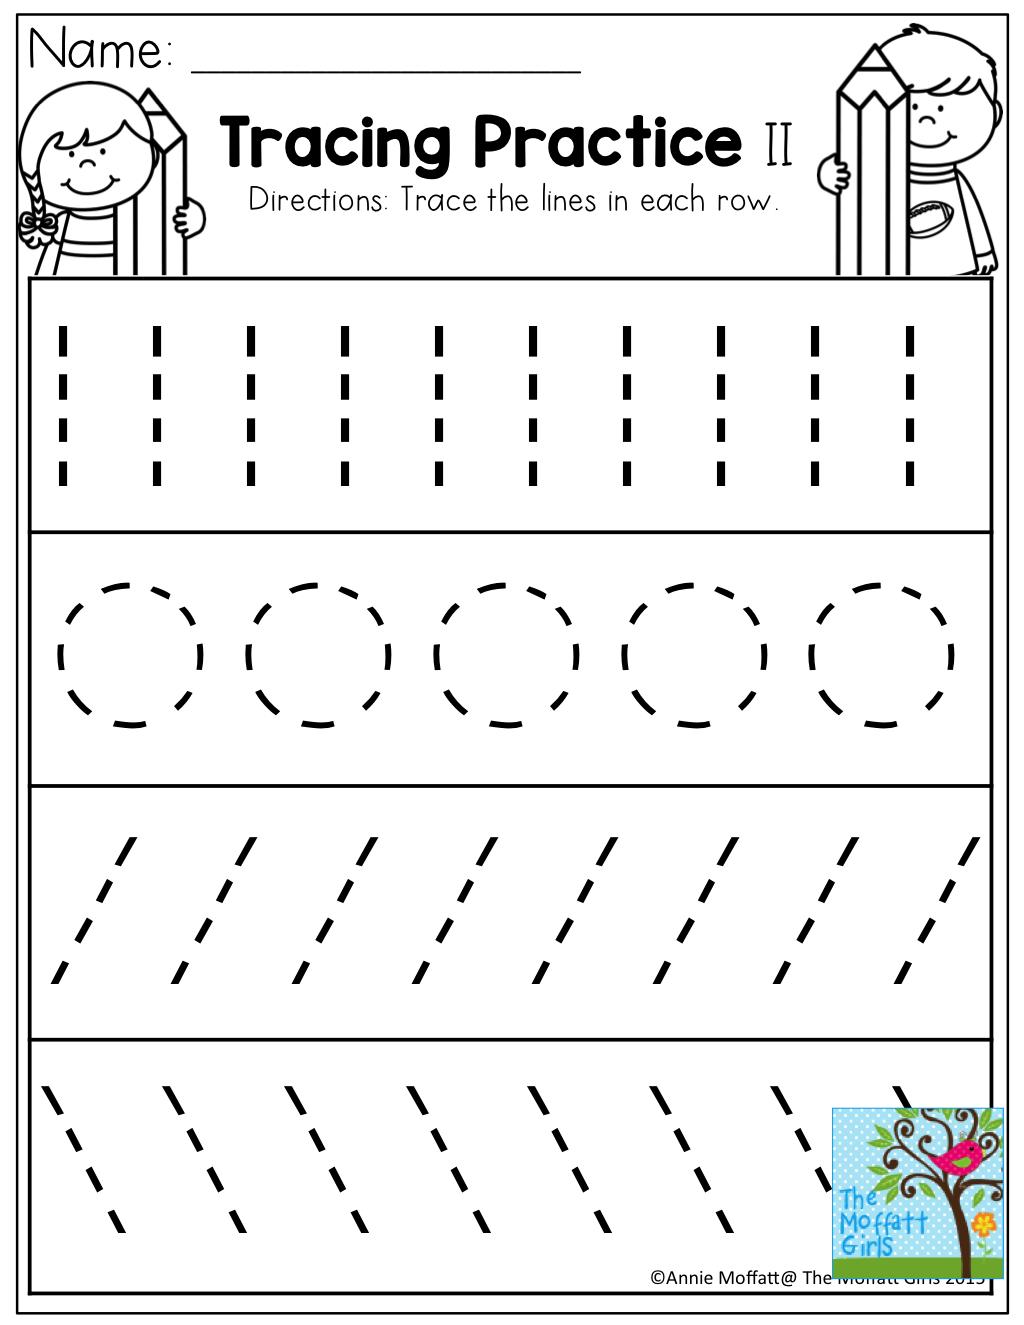 Tracing Practice! Tons Of Printable For Pre-K, Kindergarten, 1St | Printable Tracing Worksheets